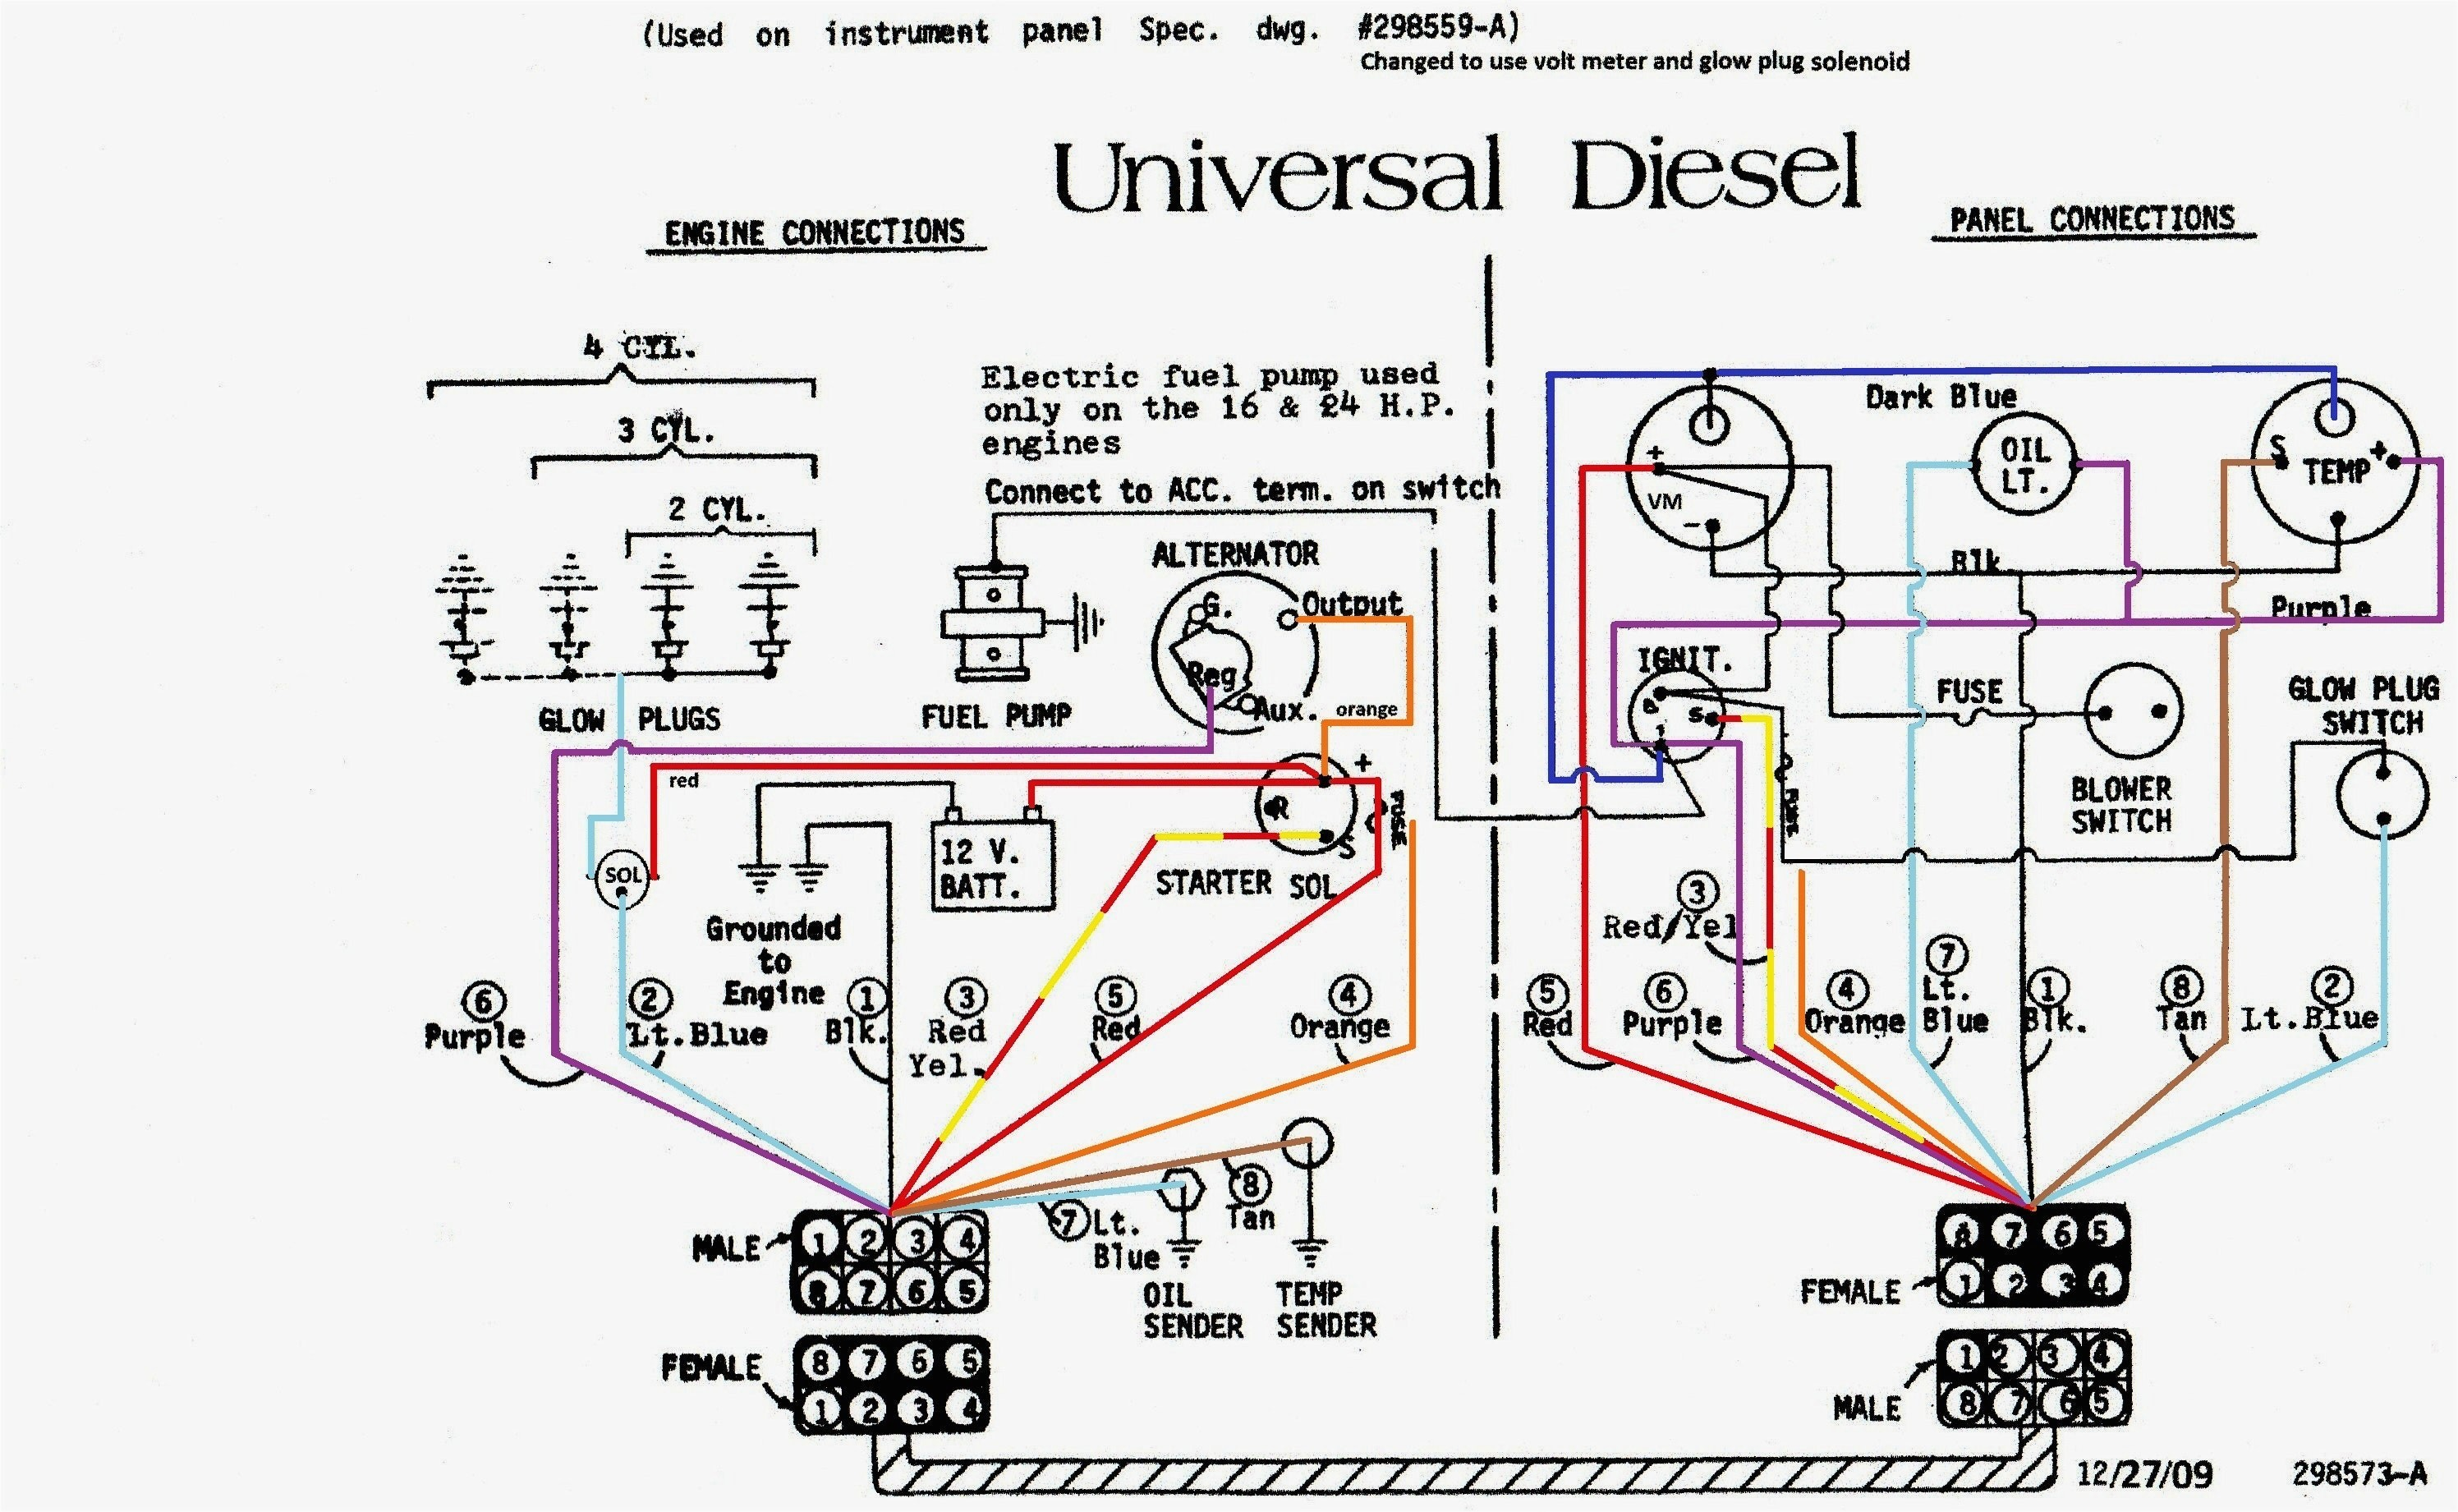 Blazer Trailer Lights Wiring Diagram Solutions 2007 Jeep Grand Cherokee Light Boat Led